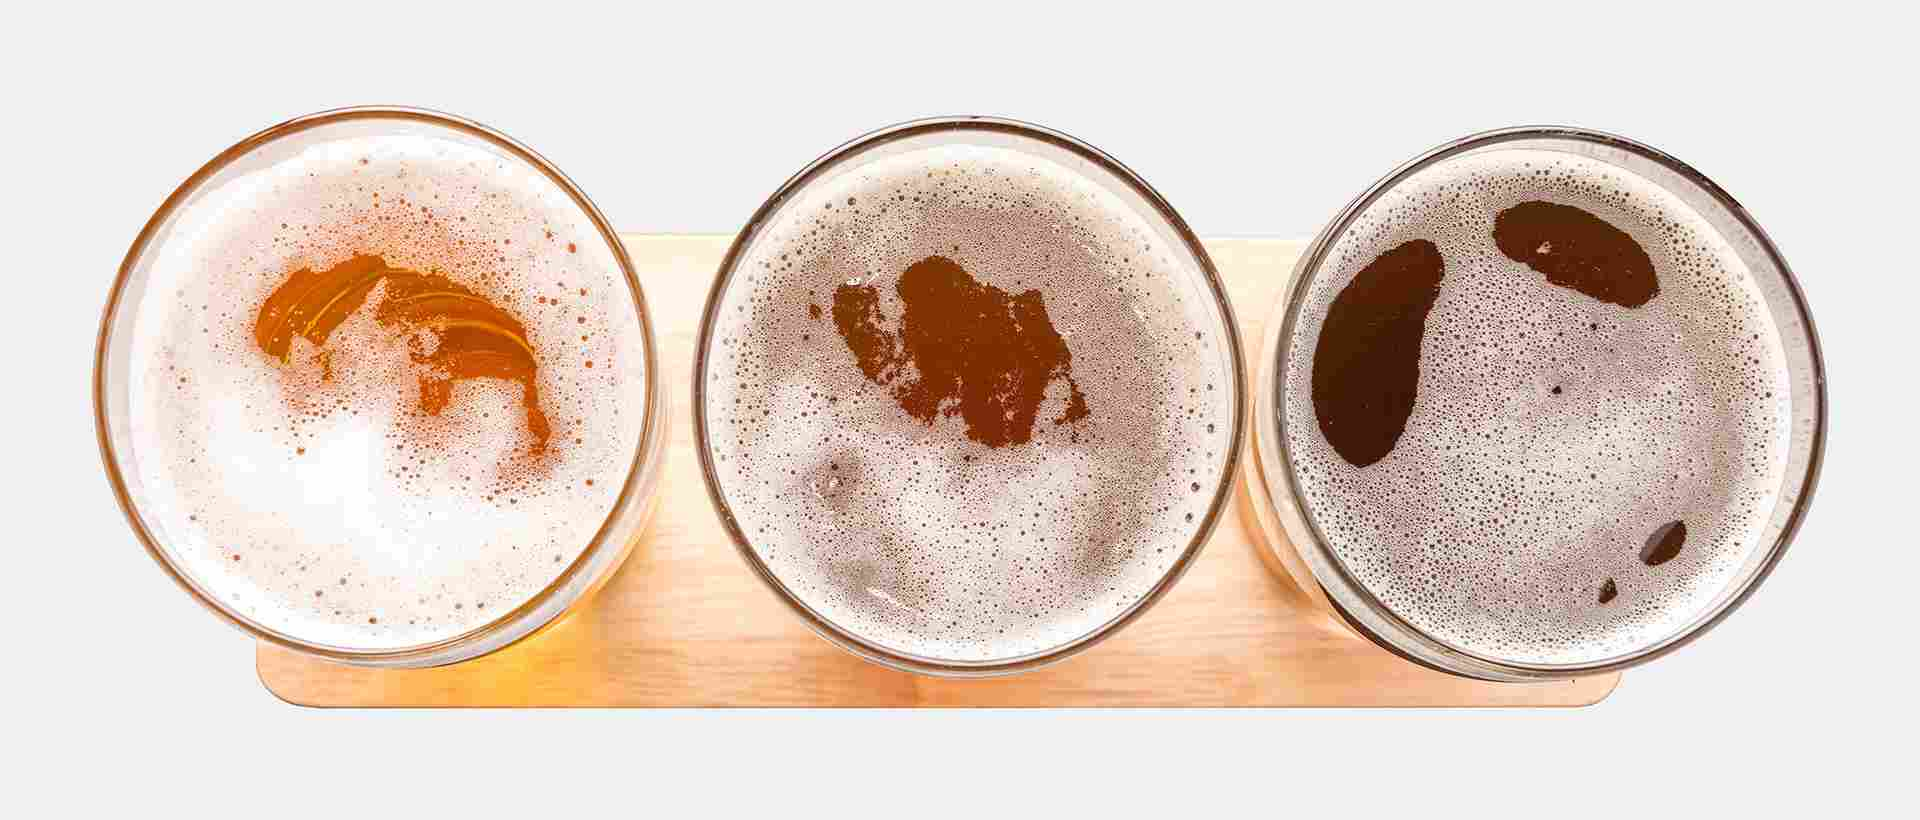 https://www.cafemulder.eu/wp-content/uploads/2017/05/hero_beer_glasses.jpg